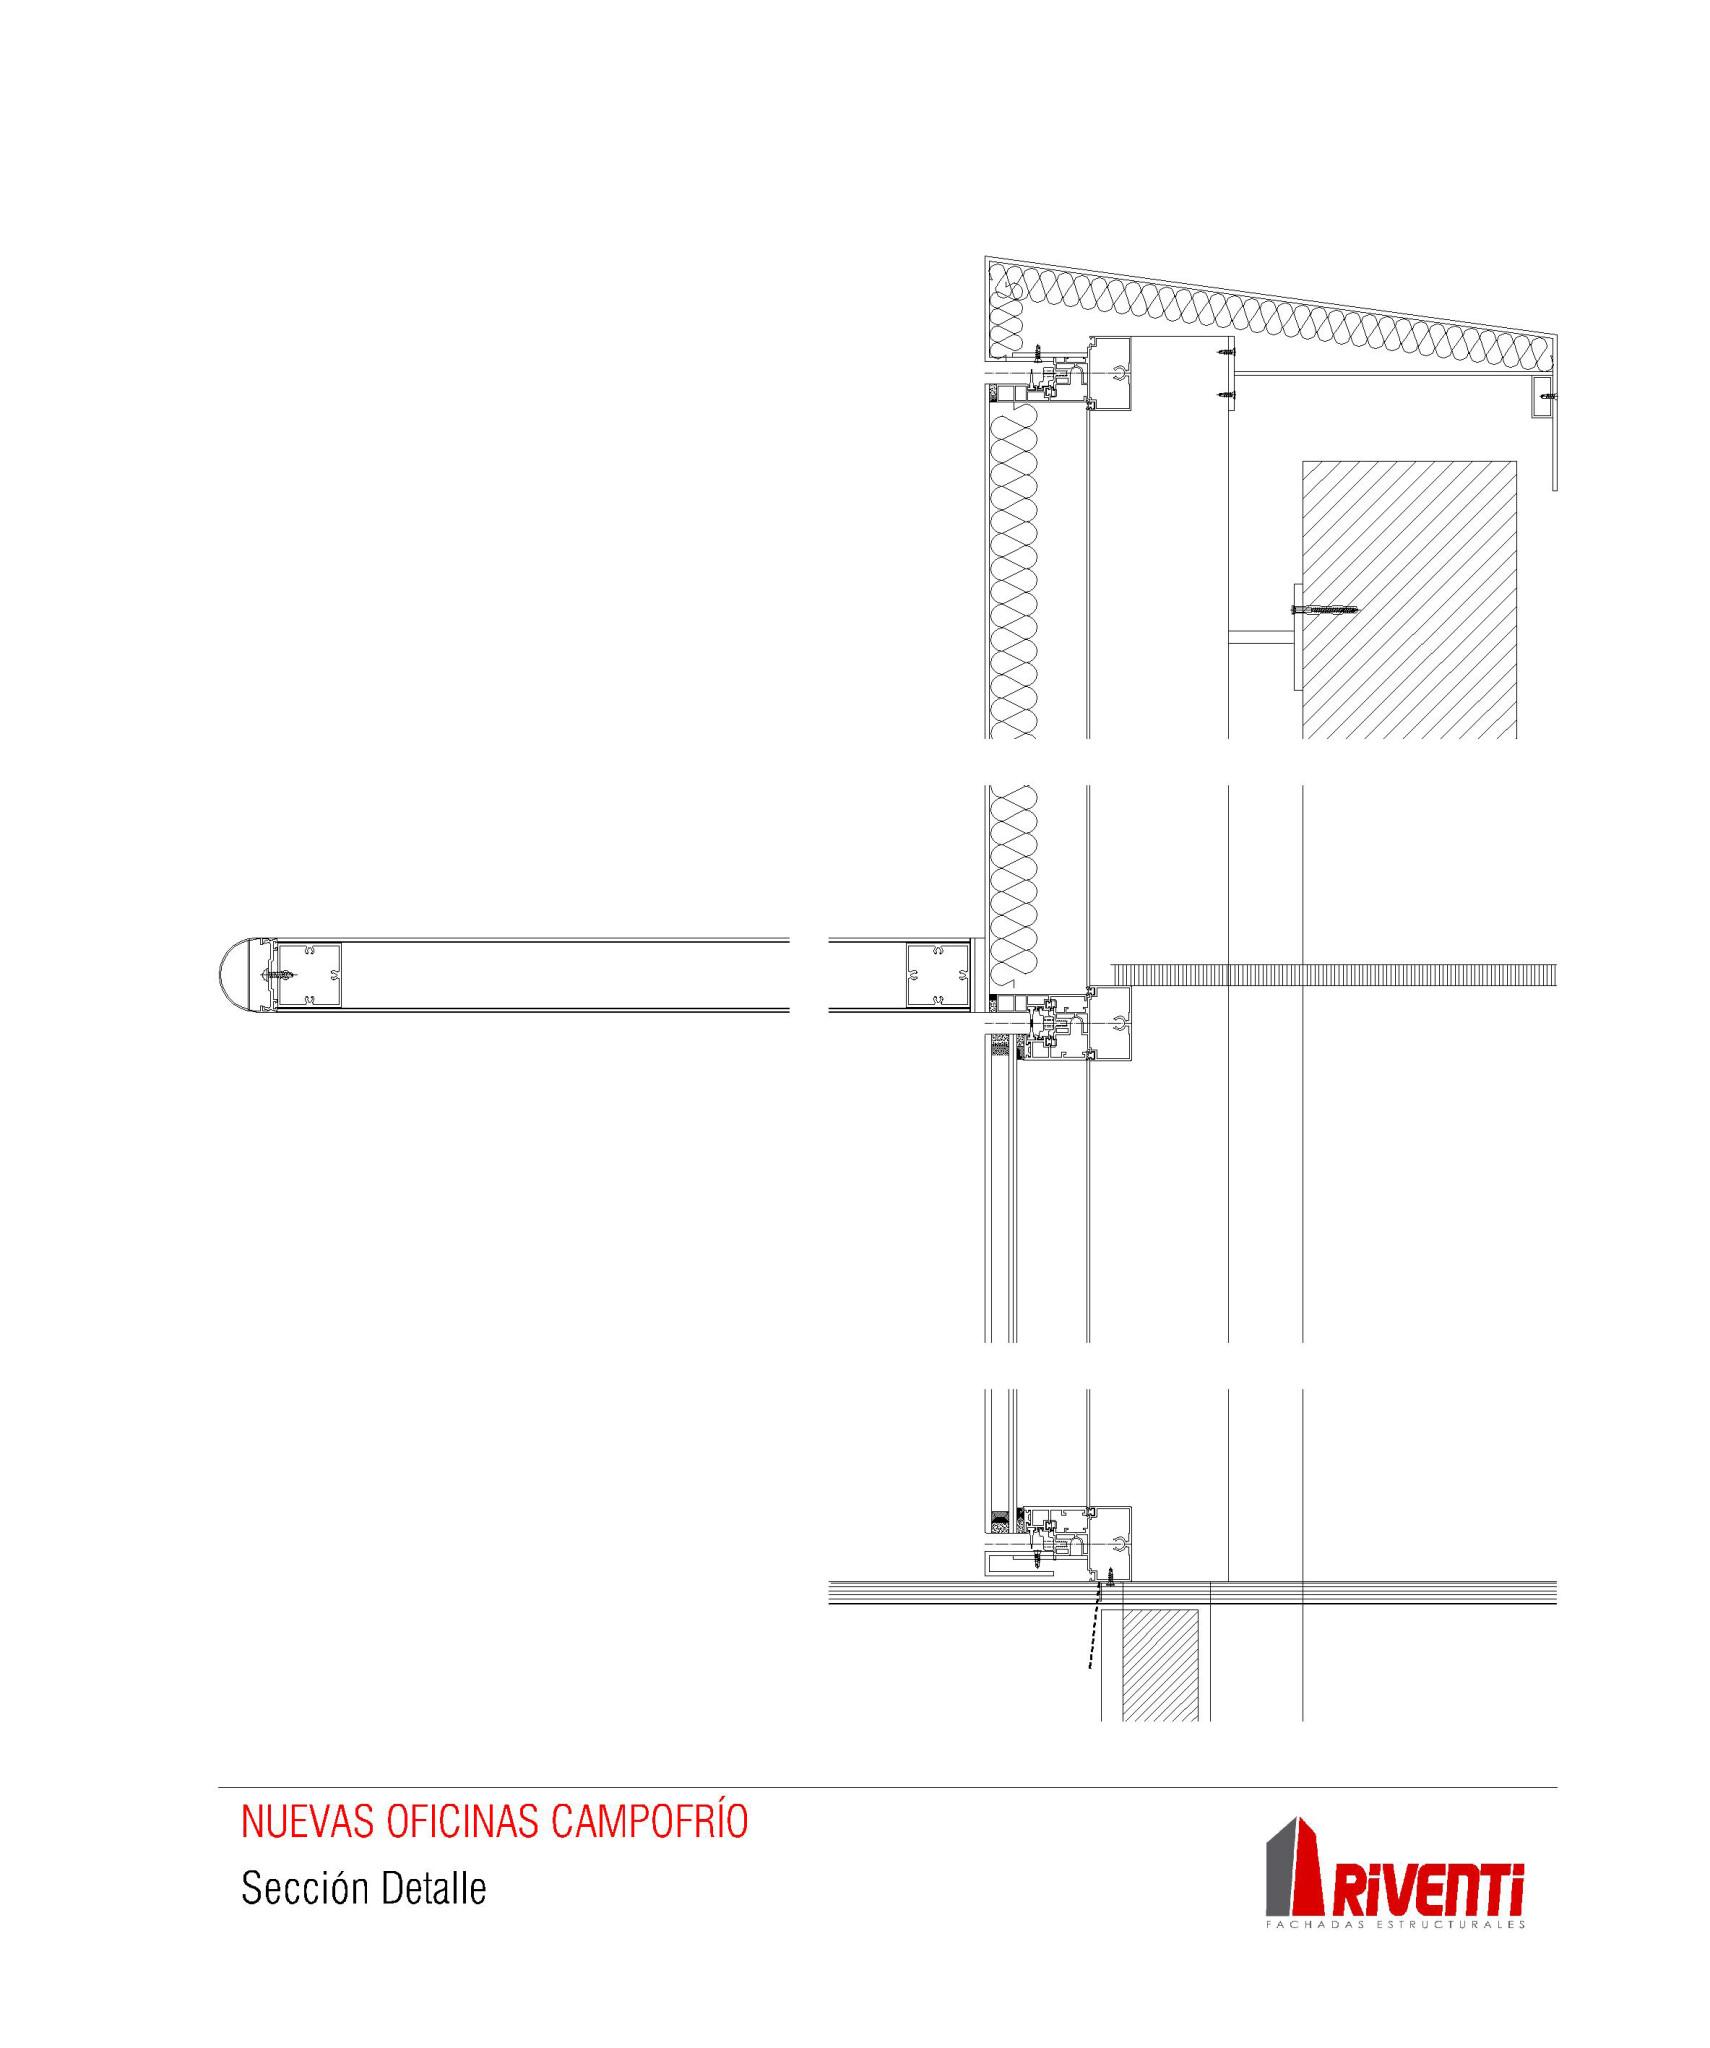 Fachada-oficinas-campofrio-Burgos_Riventi_muro-cortina-brise-soleil_detalle-construtivo (1)